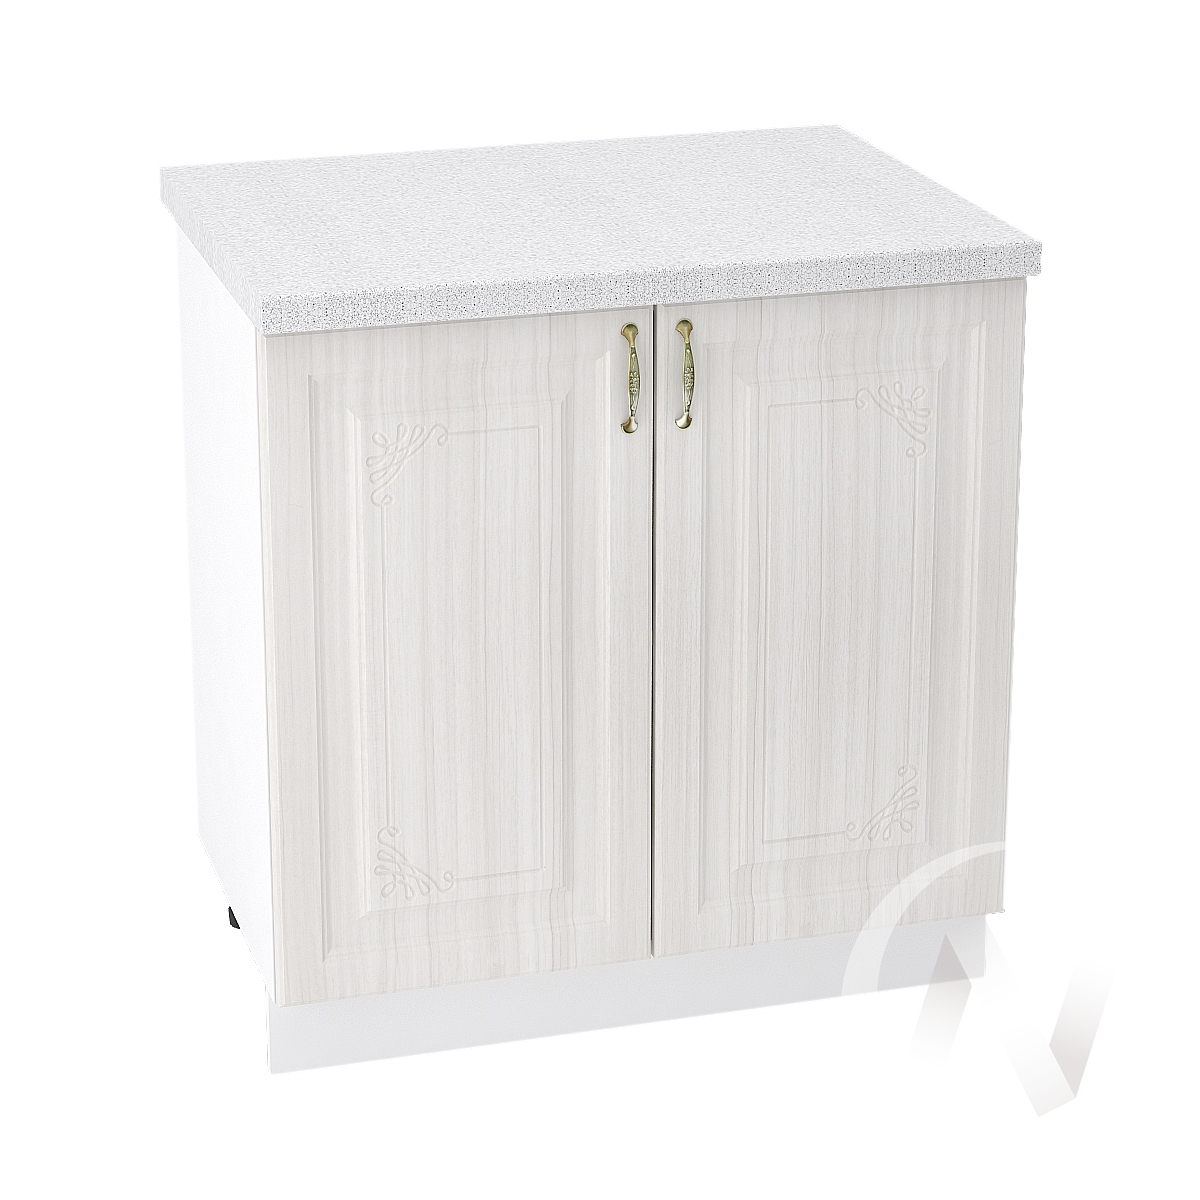 "Кухня ""Виктория"": Шкаф нижний 800, ШН 800 новый (корпус белый)"